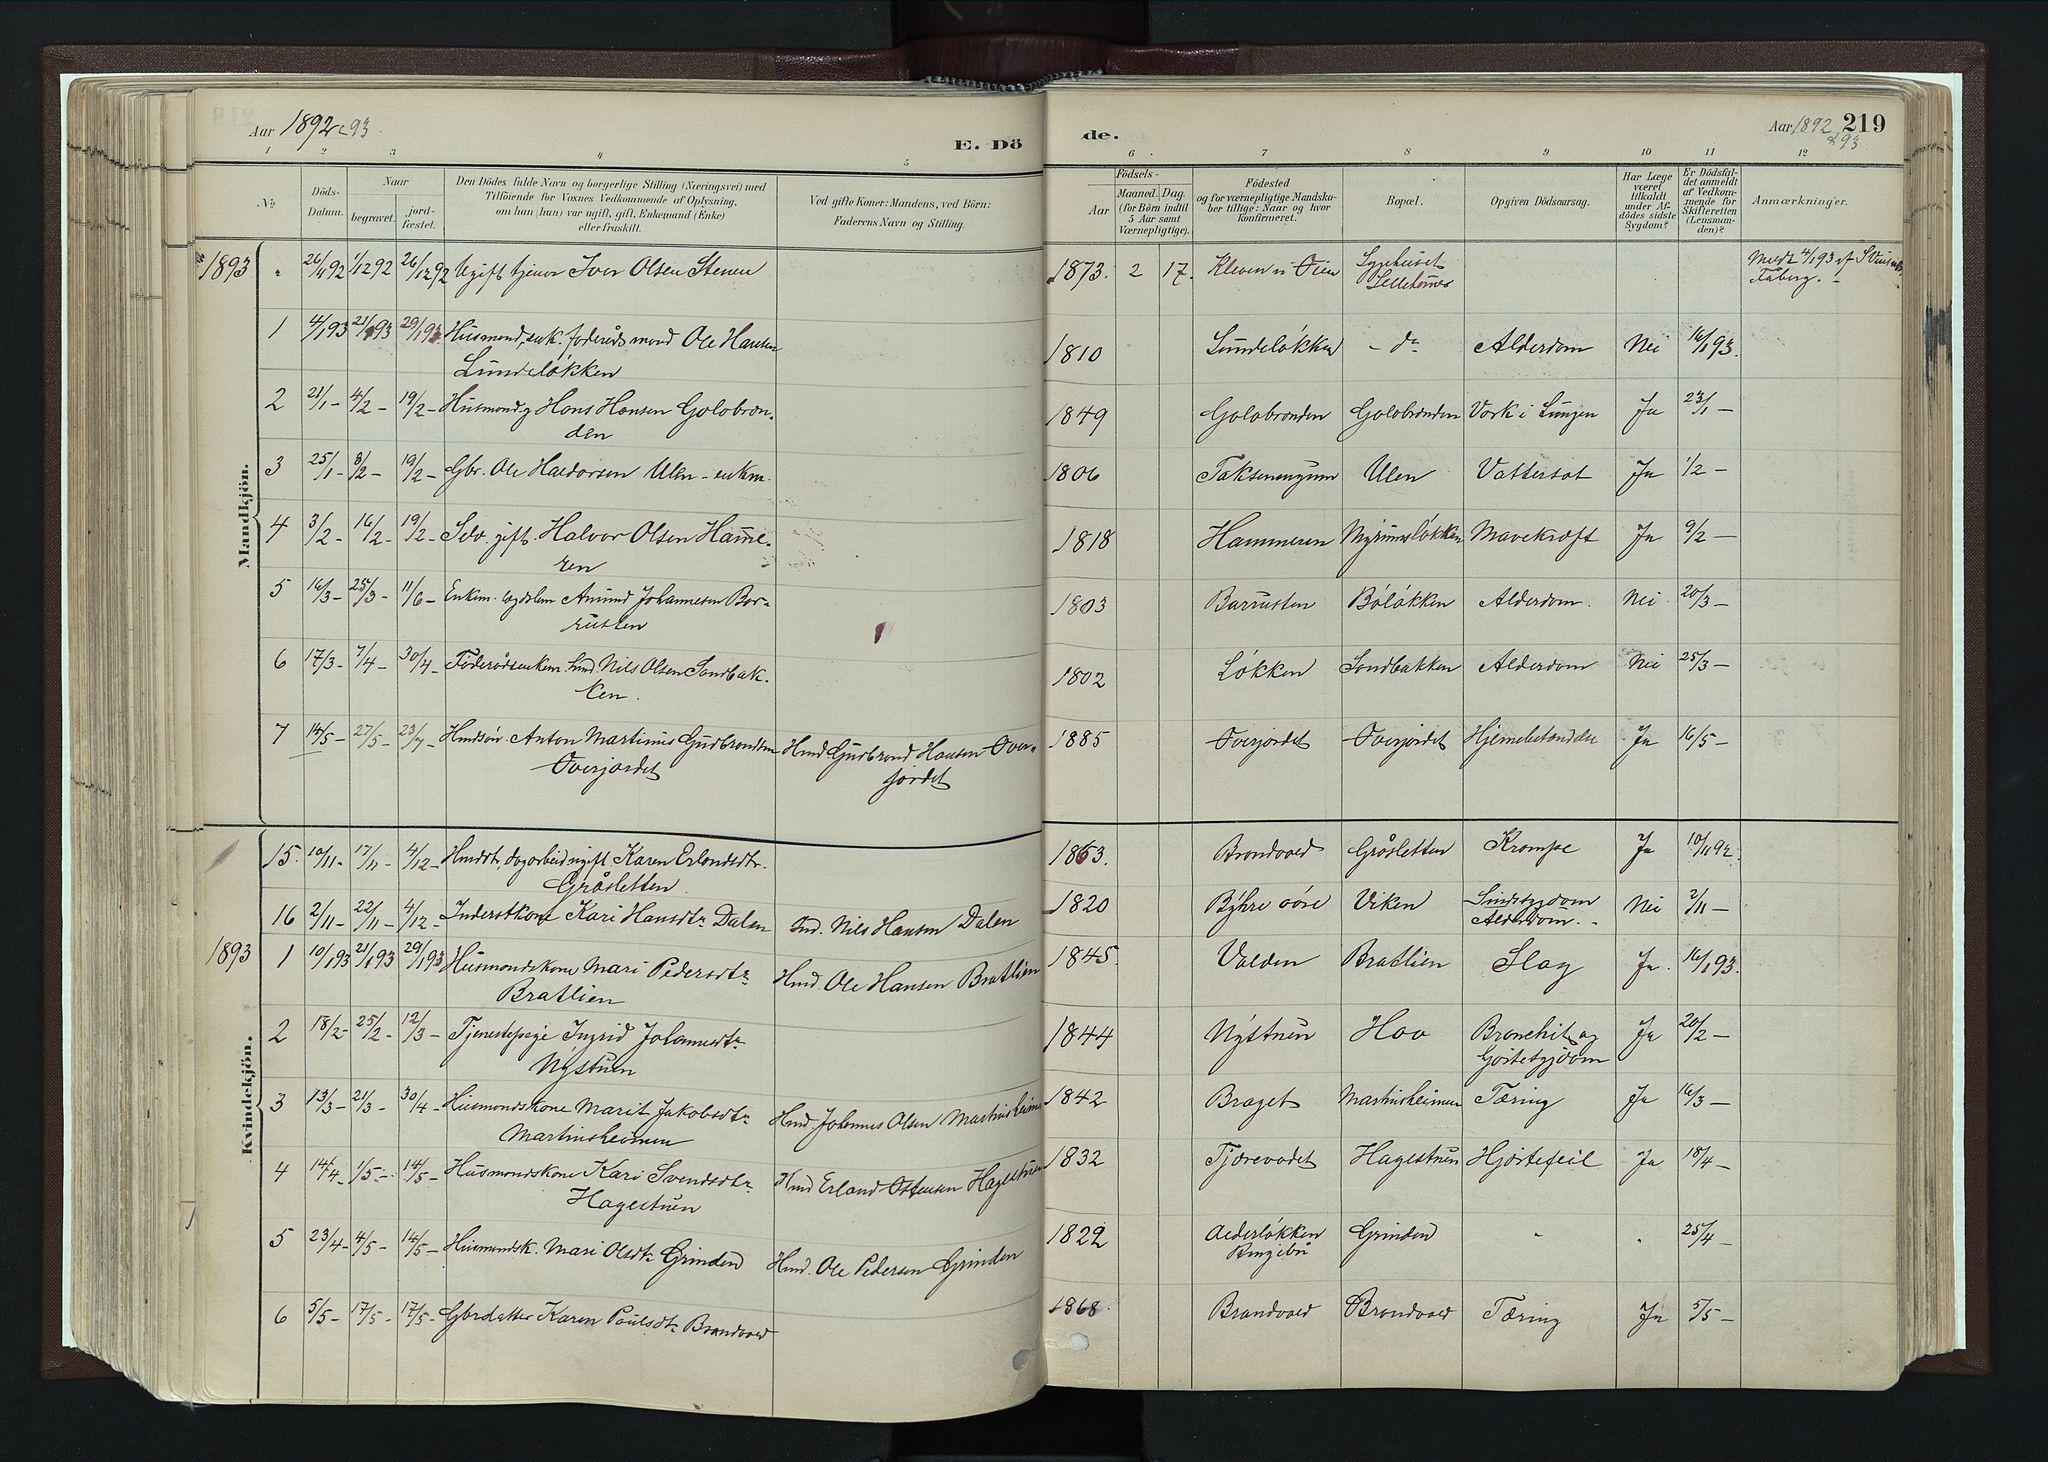 SAH, Nord-Fron prestekontor, Ministerialbok nr. 4, 1884-1914, s. 219